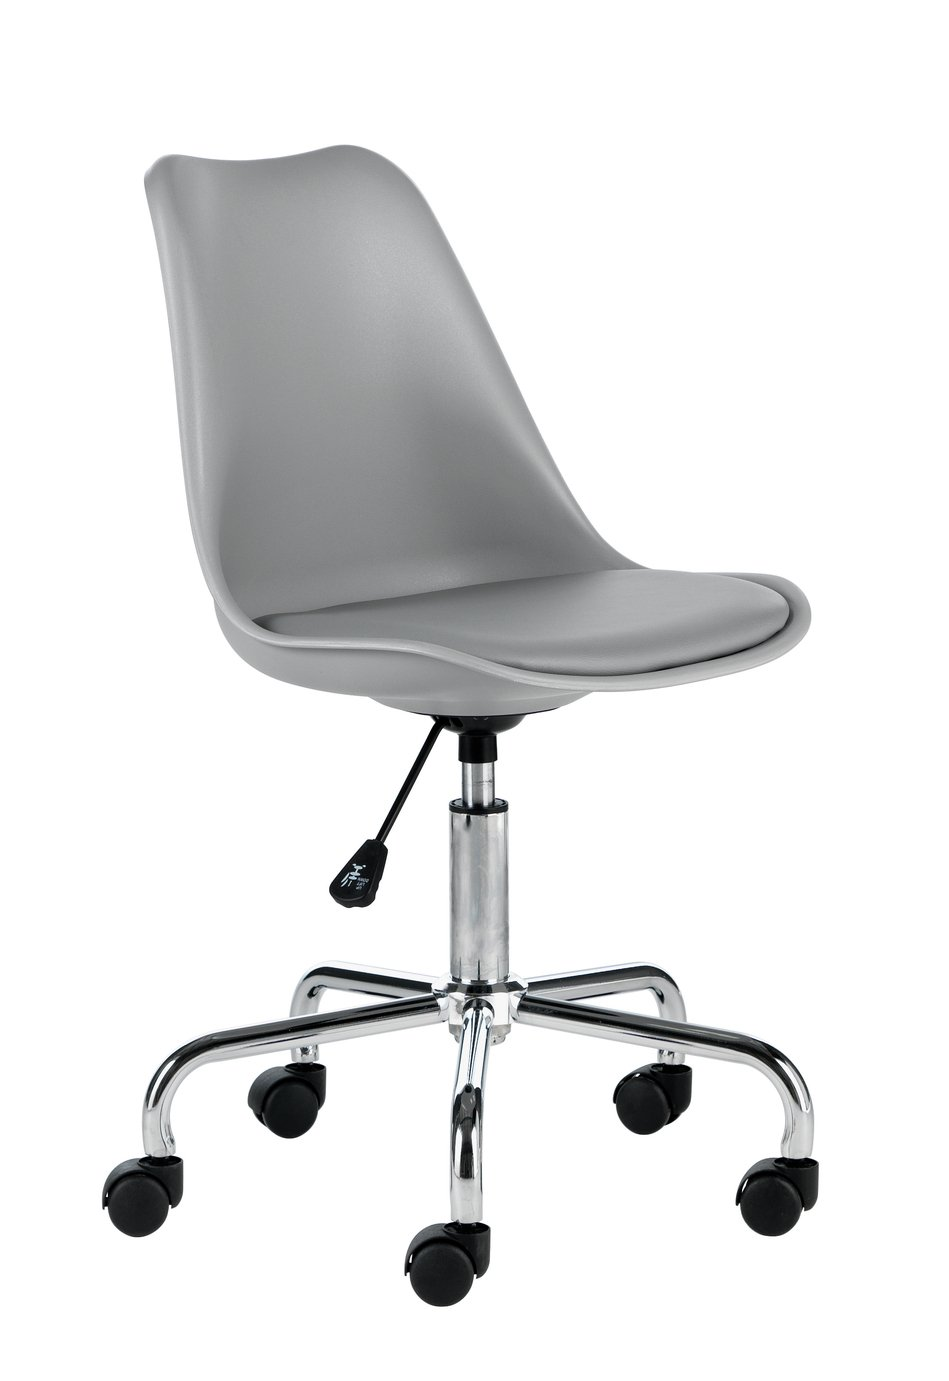 Habitat Ginnie Office Chair - Grey